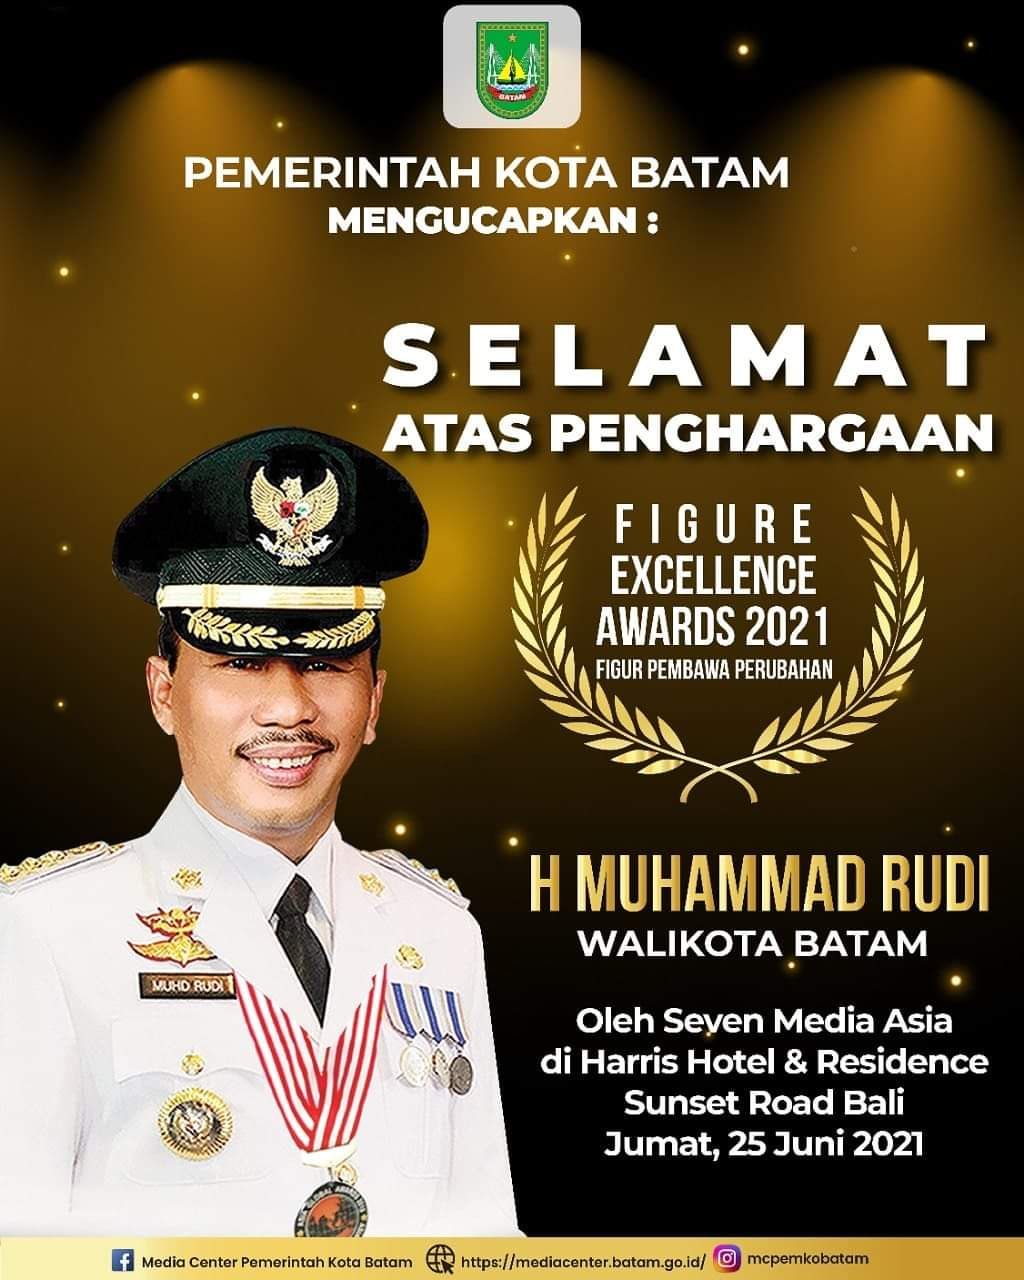 Walikota Batam Meraih Penghargaan Figur Excellence Awards 2021